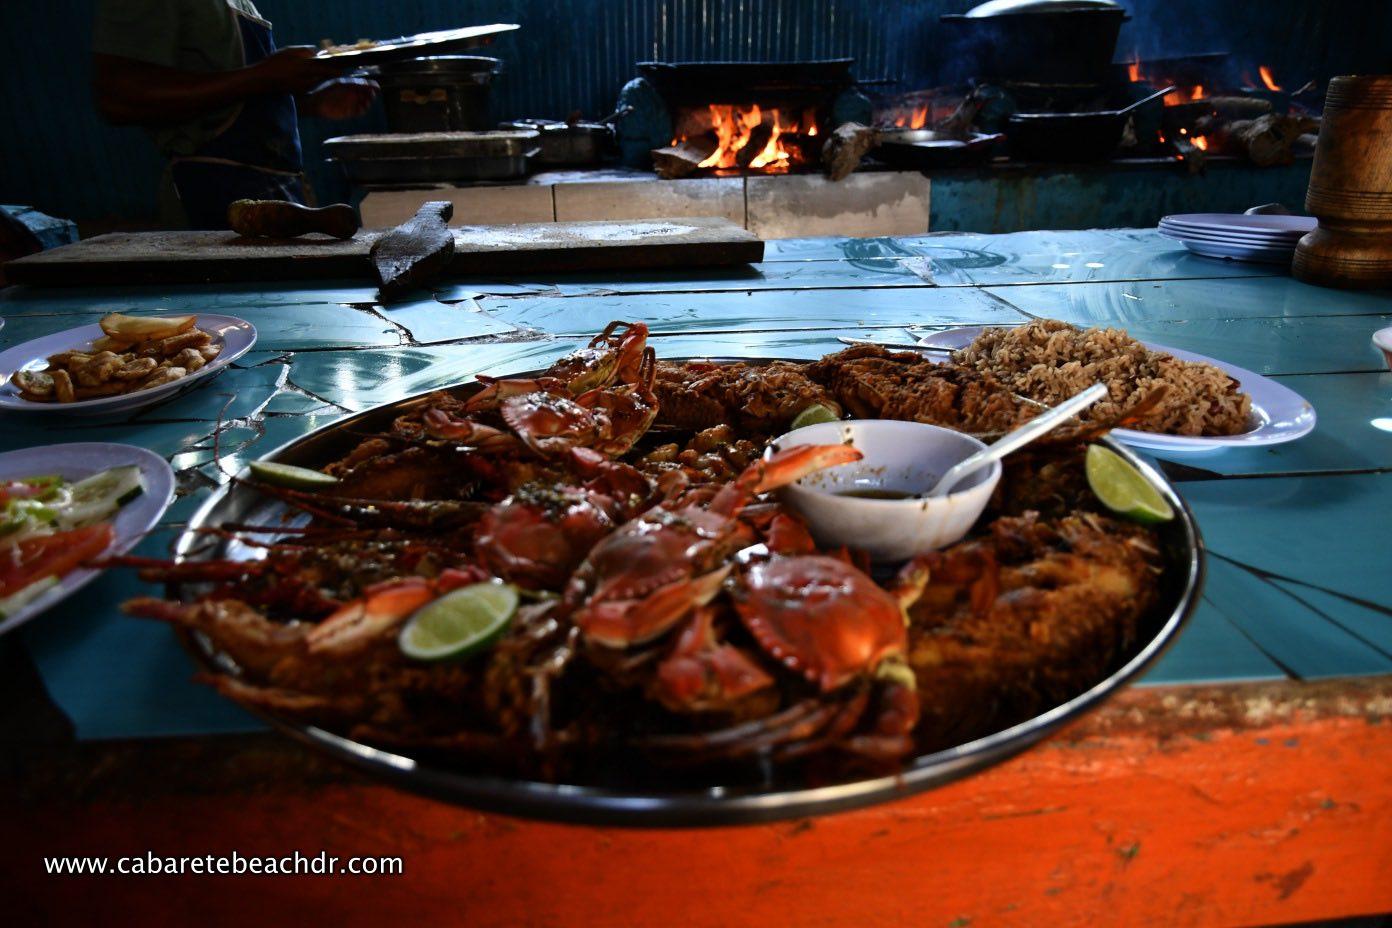 Crab and shellfish platter